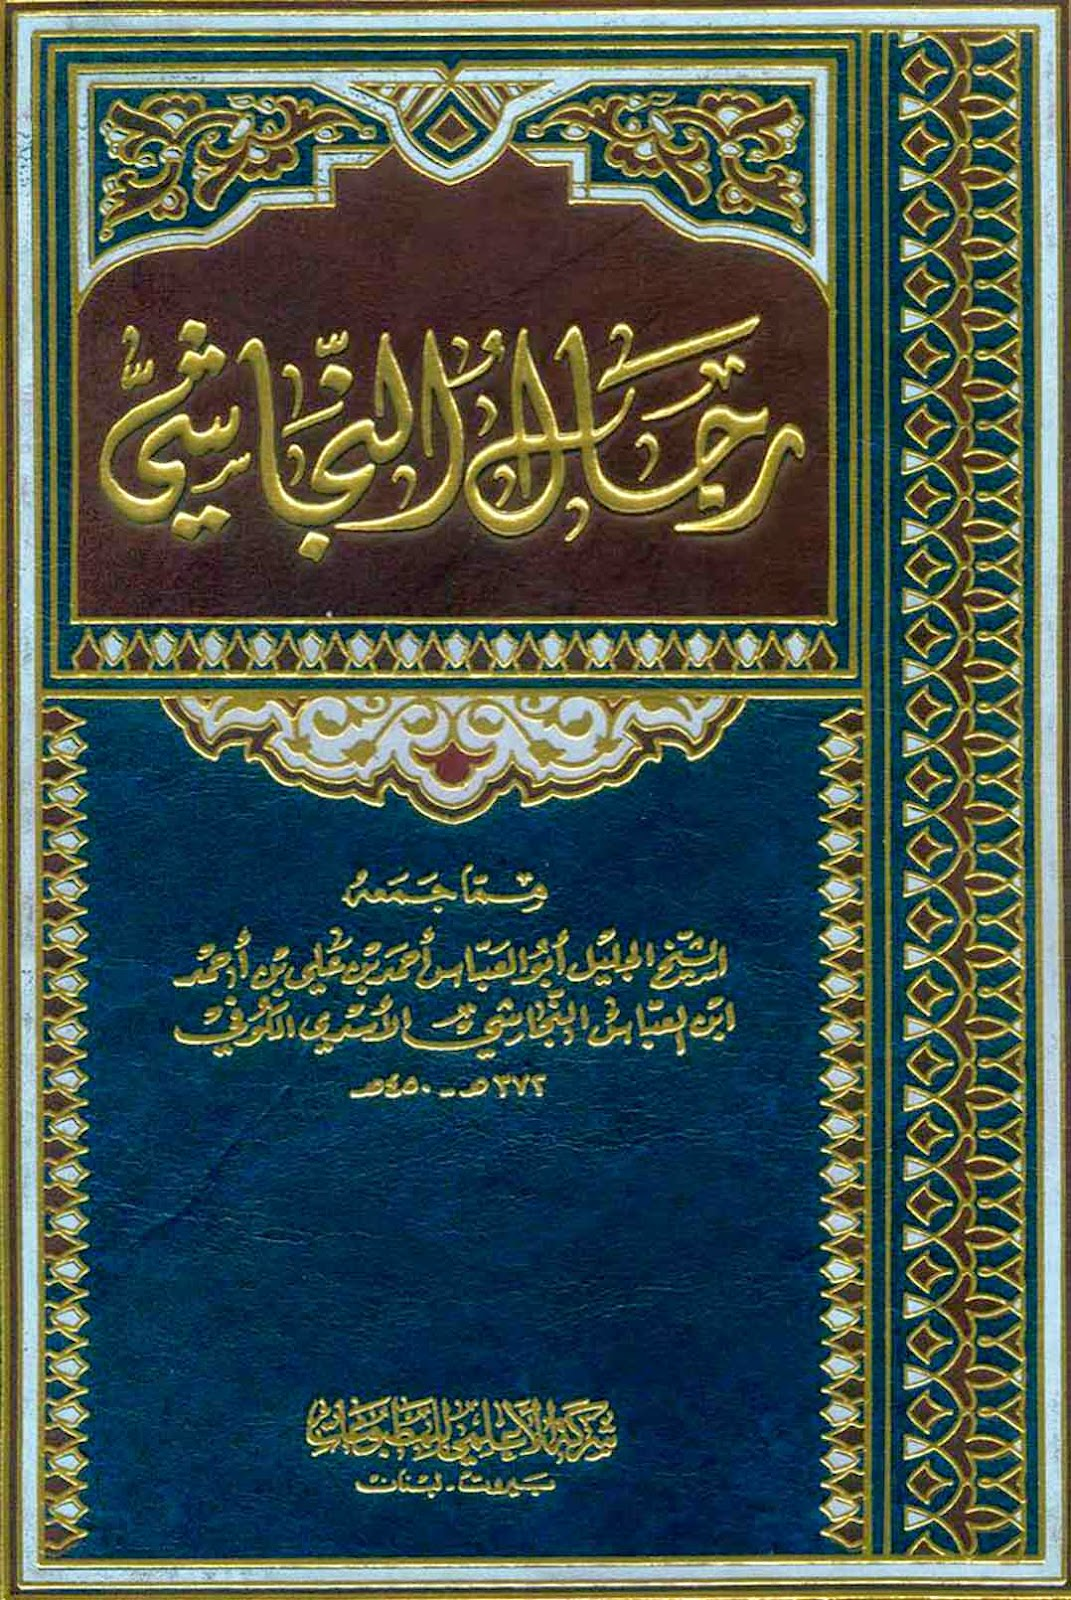 RIJAL AL KASHI EBOOK DOWNLOAD